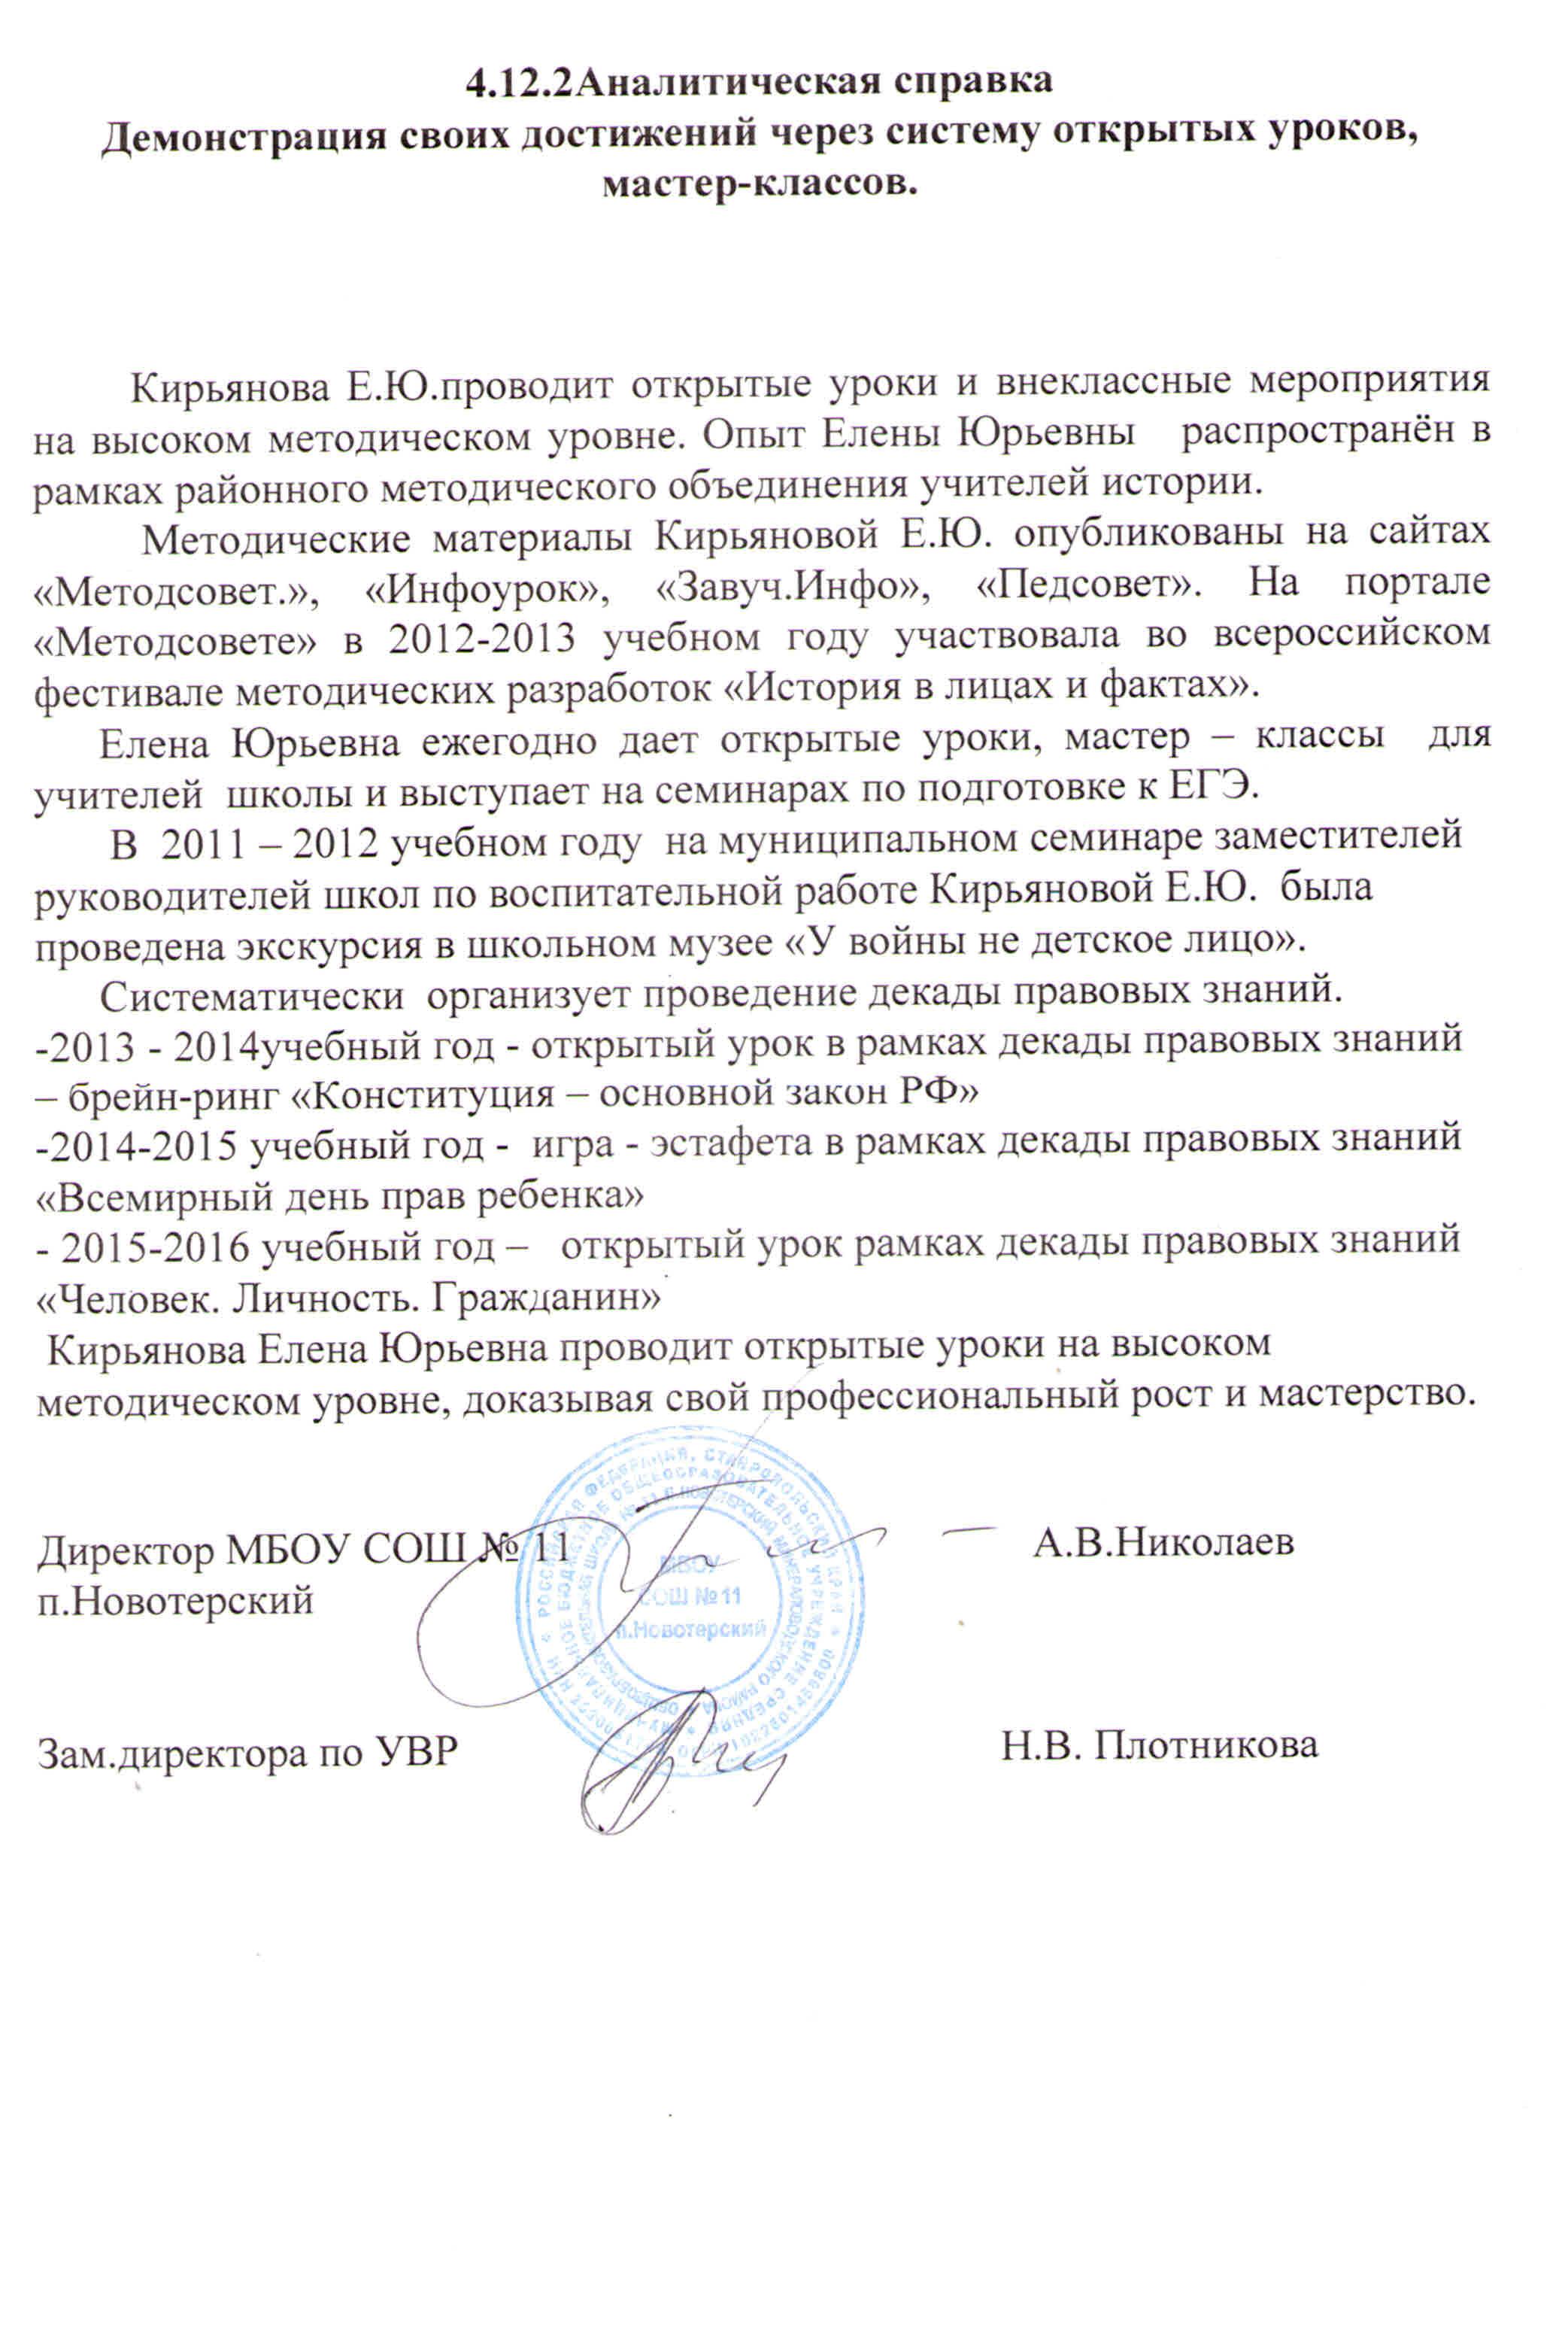 C:\Users\Сергей\Desktop\аналитсправка\Document_23.jpg